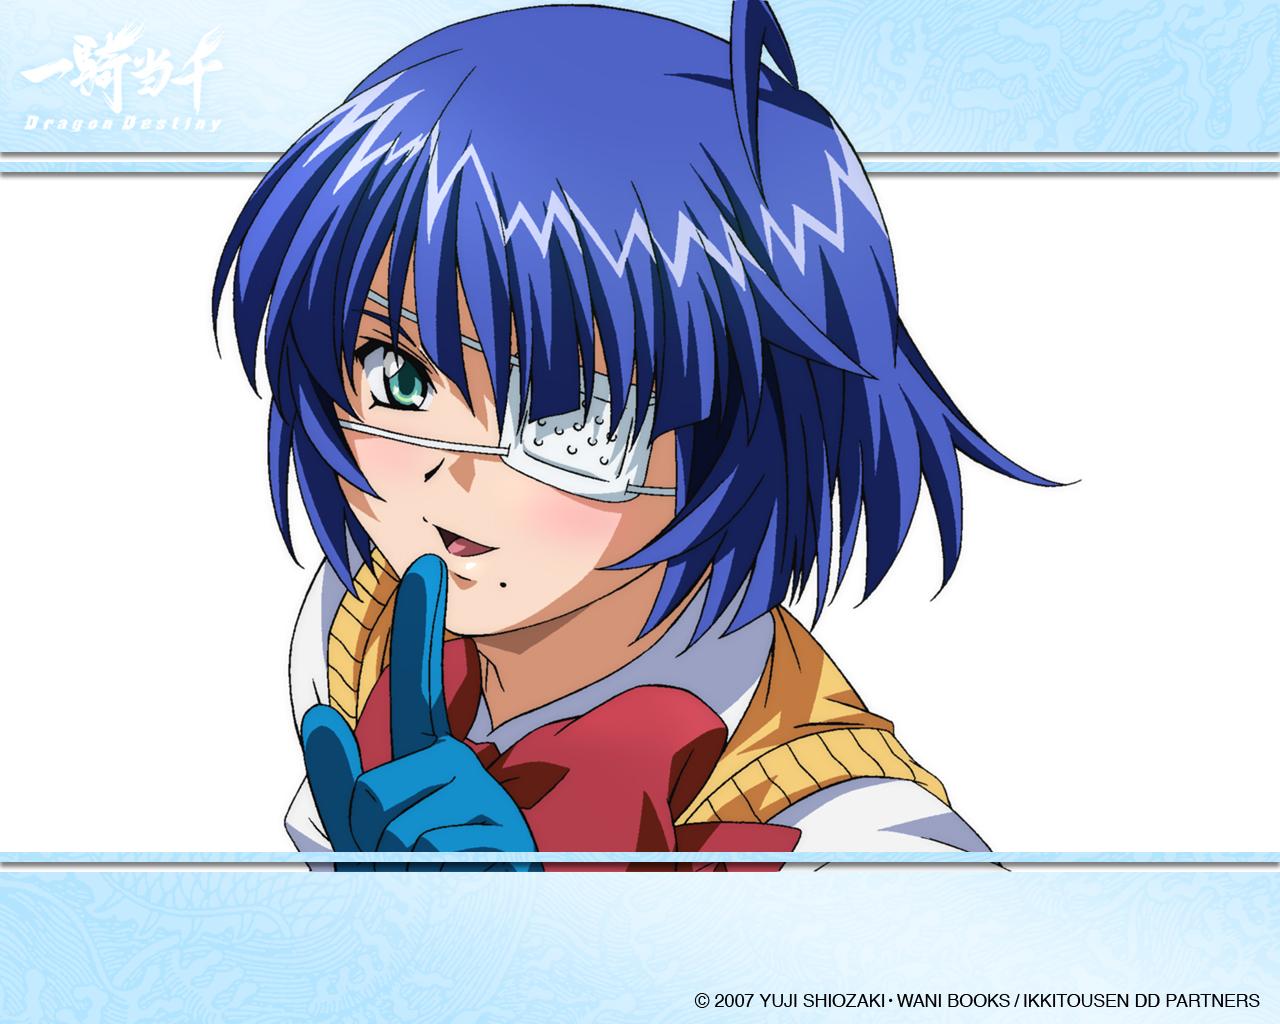 aqua_eyes blue_hair blush bow eyepatch gloves ikkitousen ryomou_shimei school_uniform short_hair tagme watermark